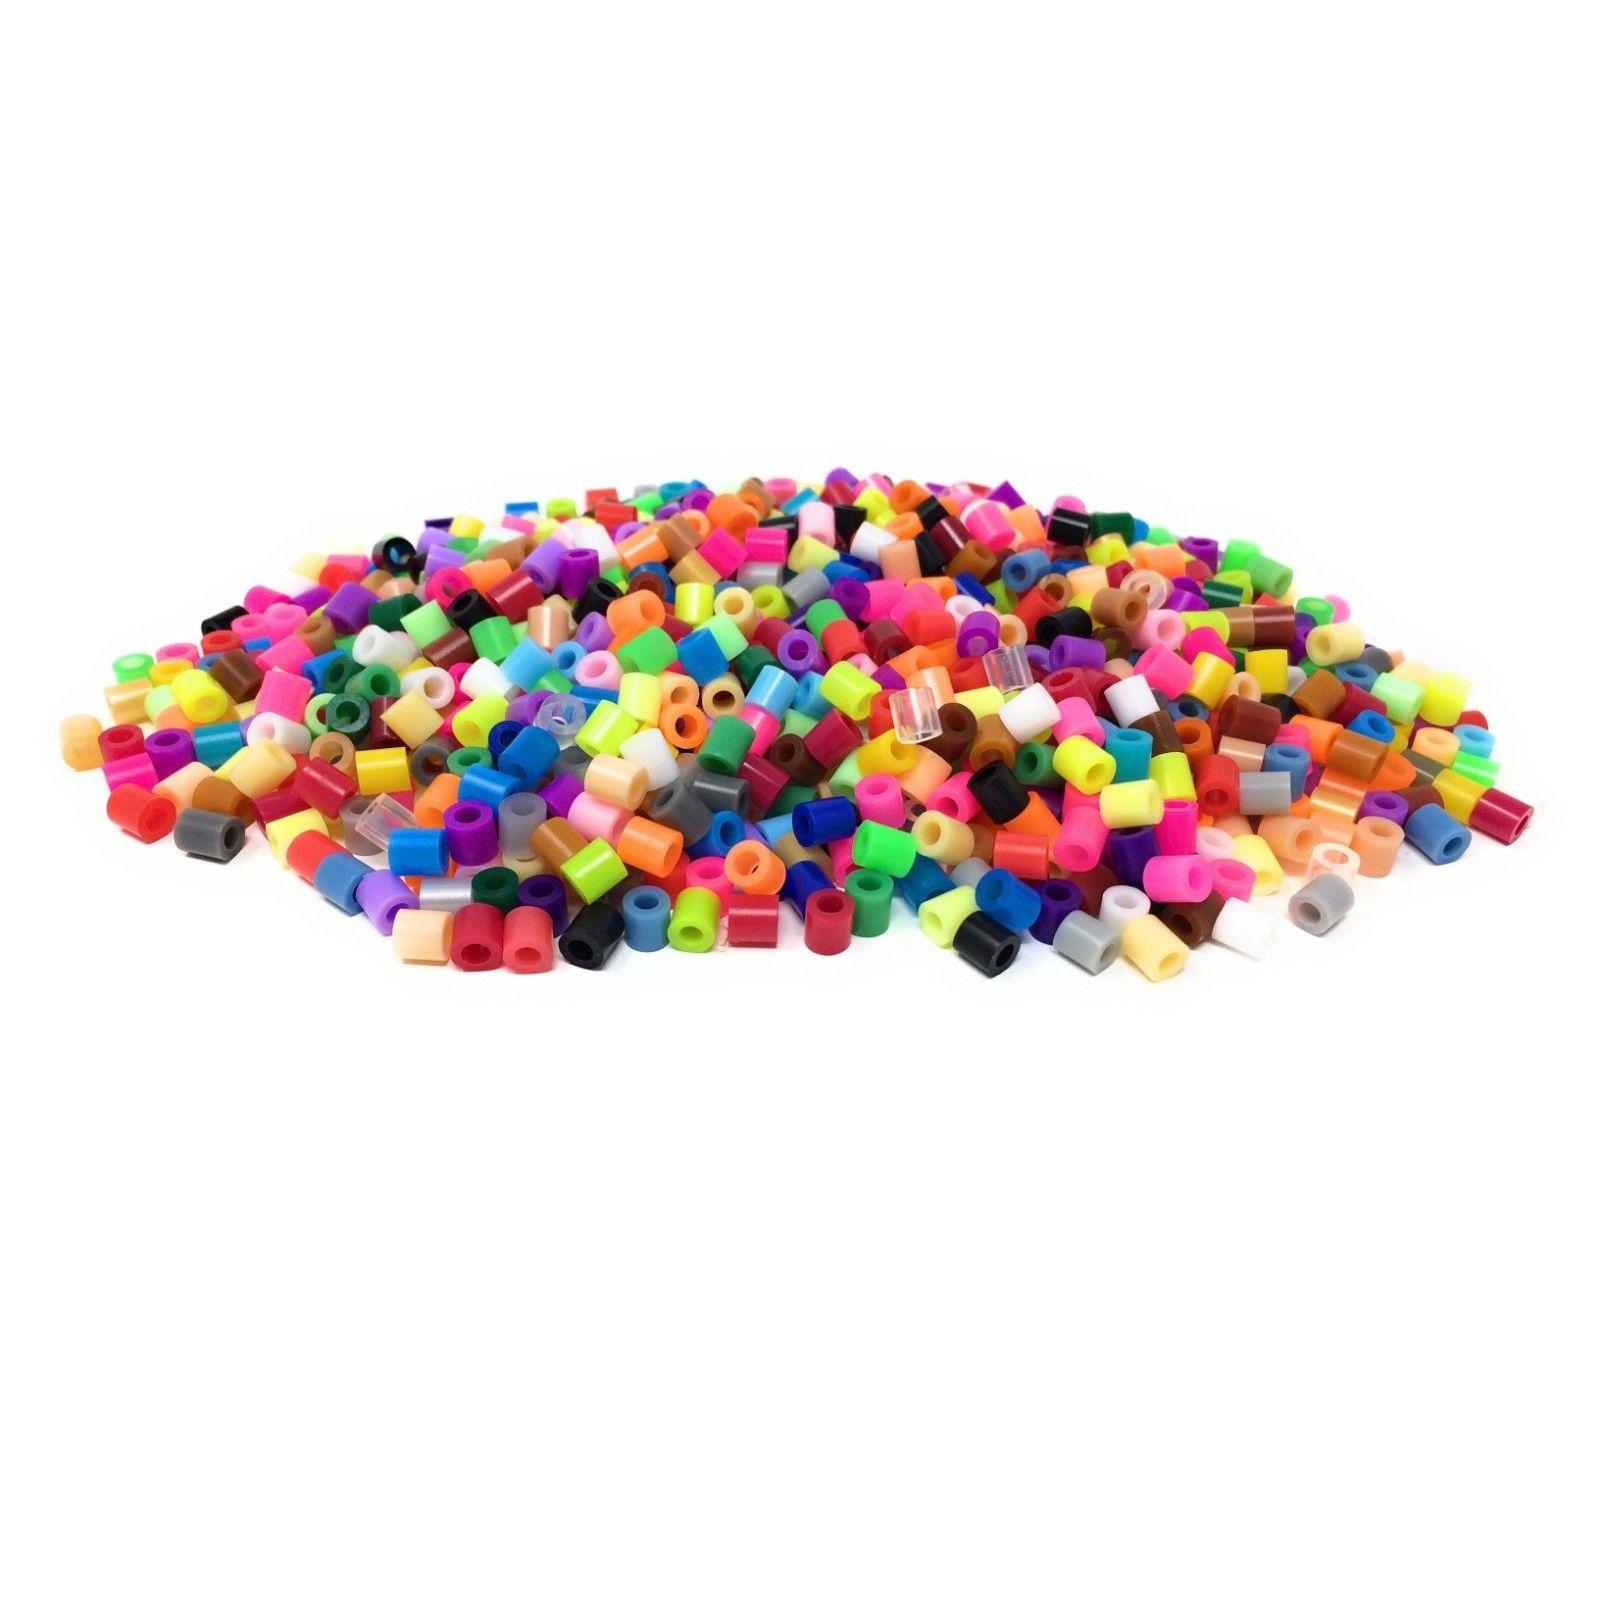 JINLETONG puzzle 1000 pieces Hama Beads 5mm Midi perler Fuse beads Hama Bead 5mm Mixed Iron Kids jigsaw puzzle Educational Toys 18